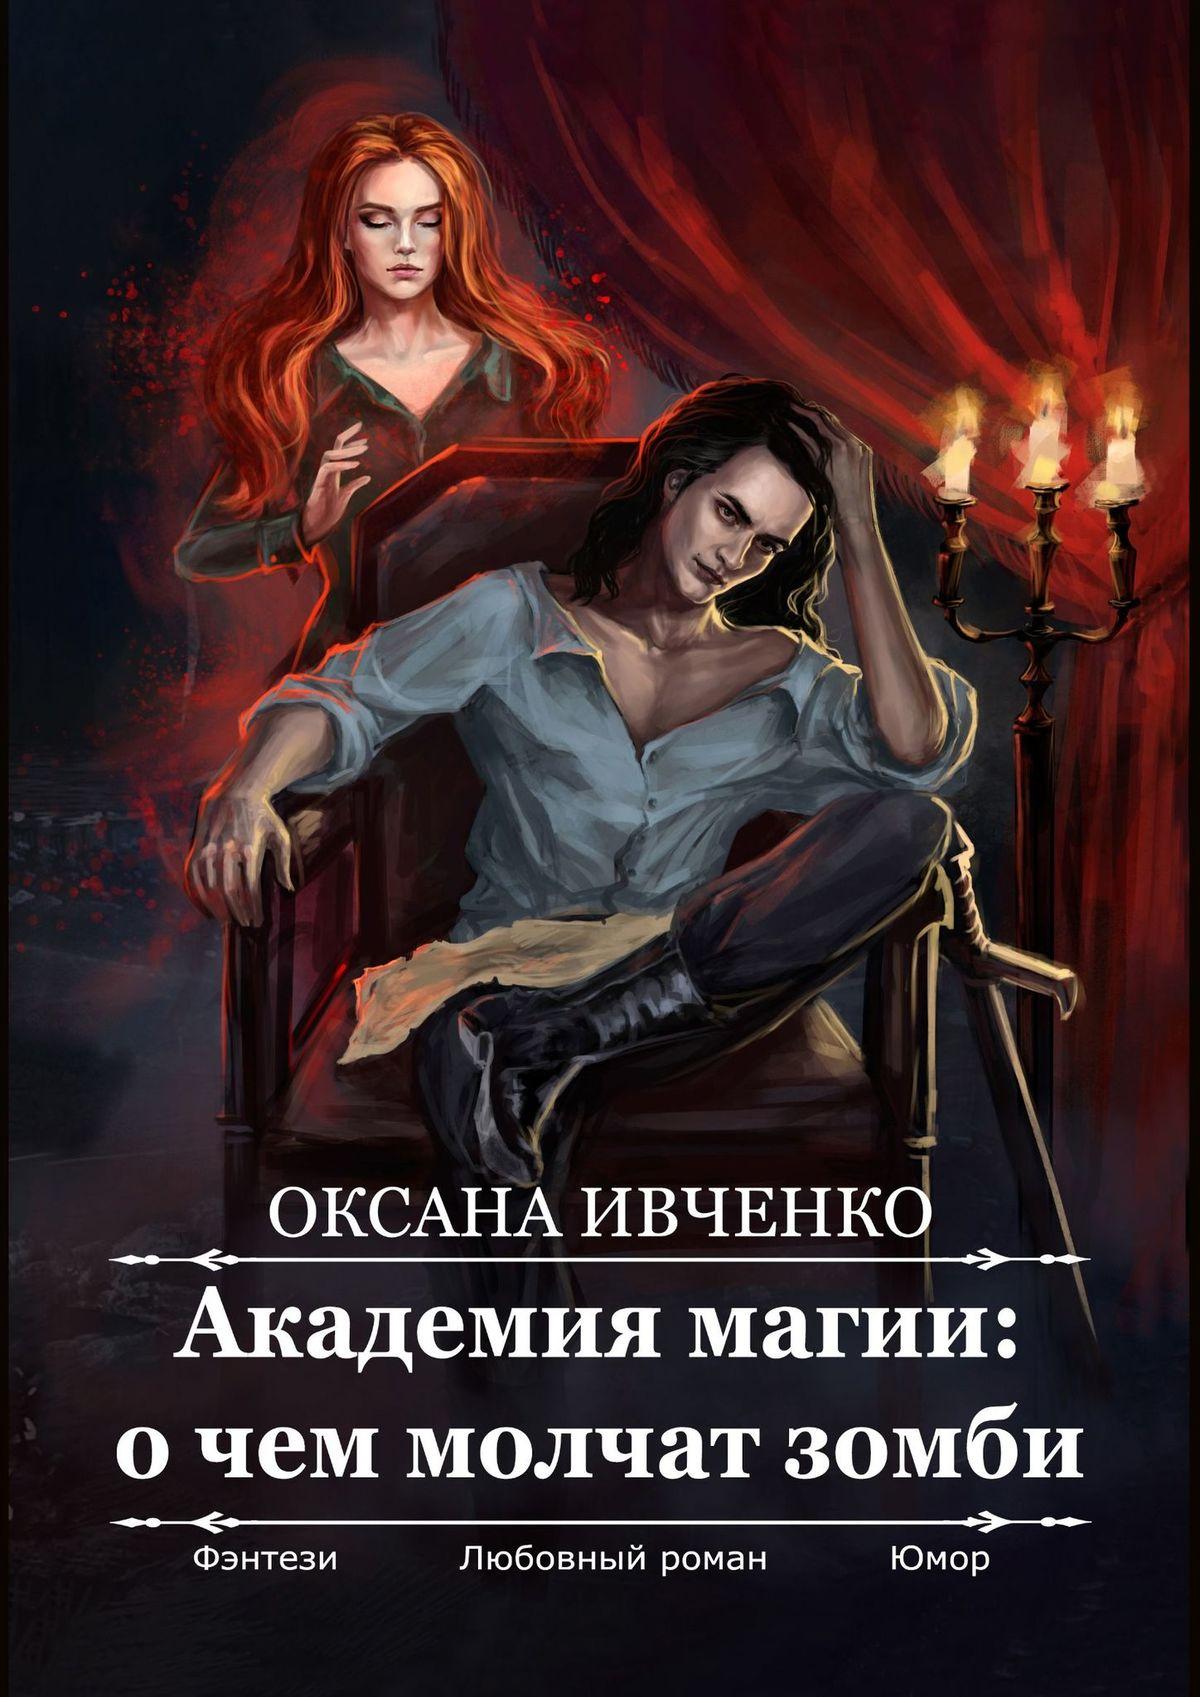 Оксана Александровна Ивченко. Академия магии: очем молчат зомби